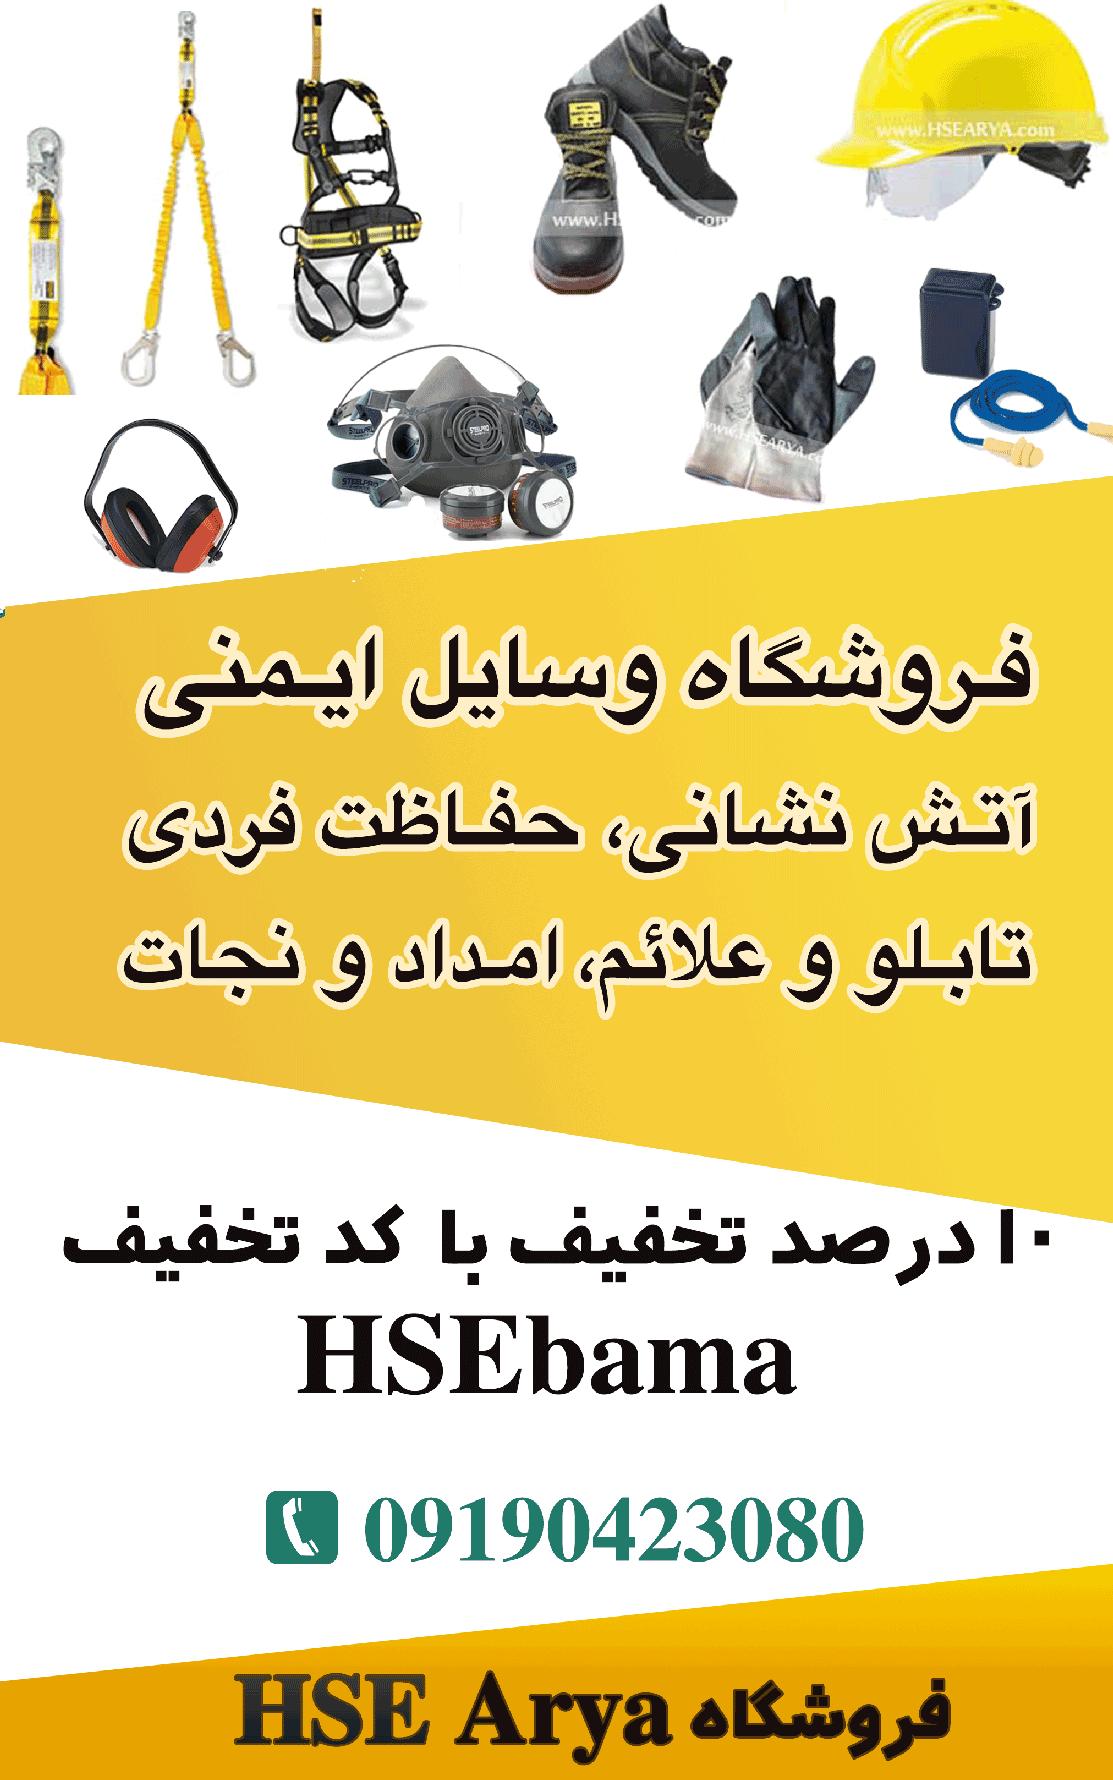 فروشگاه HSE آریا